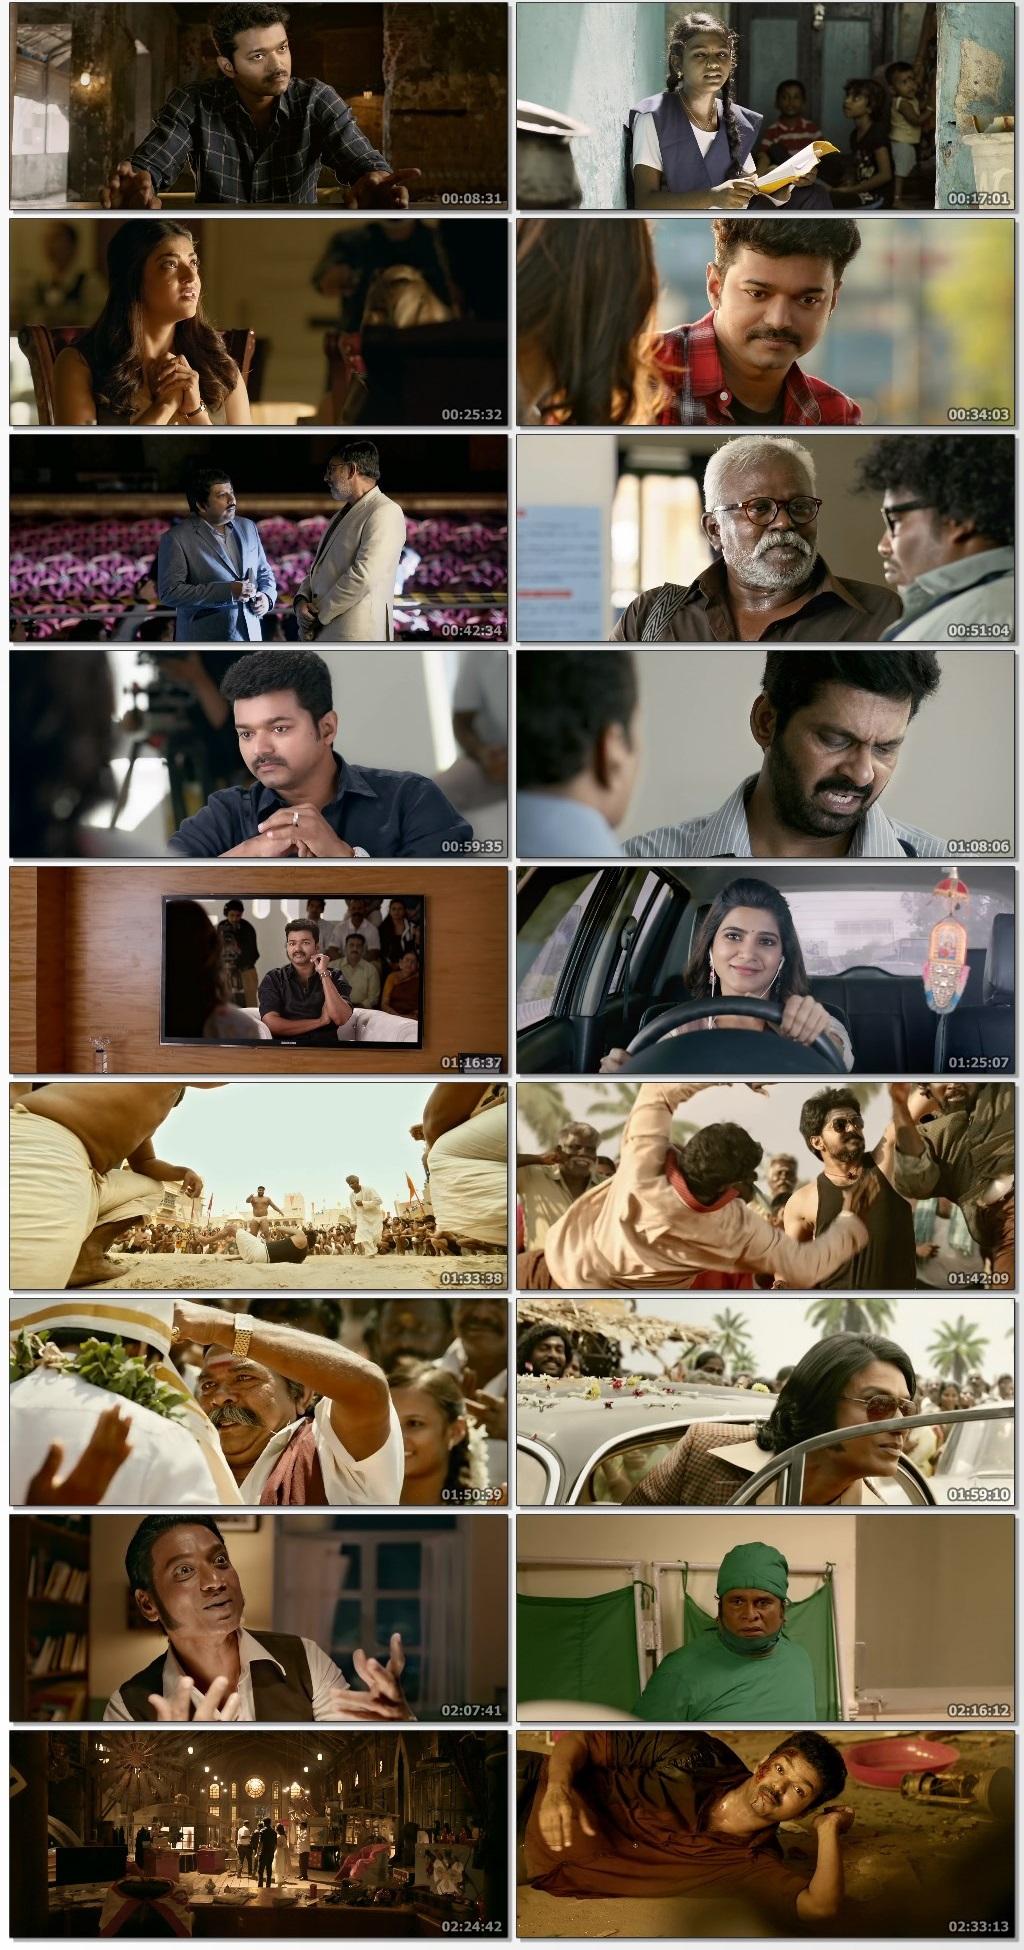 www-7-Star-HD-Bike-Mersal-2017-Hindi-Fan-Dubbed-And-Tamil-Esub-No-Ads-HEVC-1080p-1-mkv-thumbs